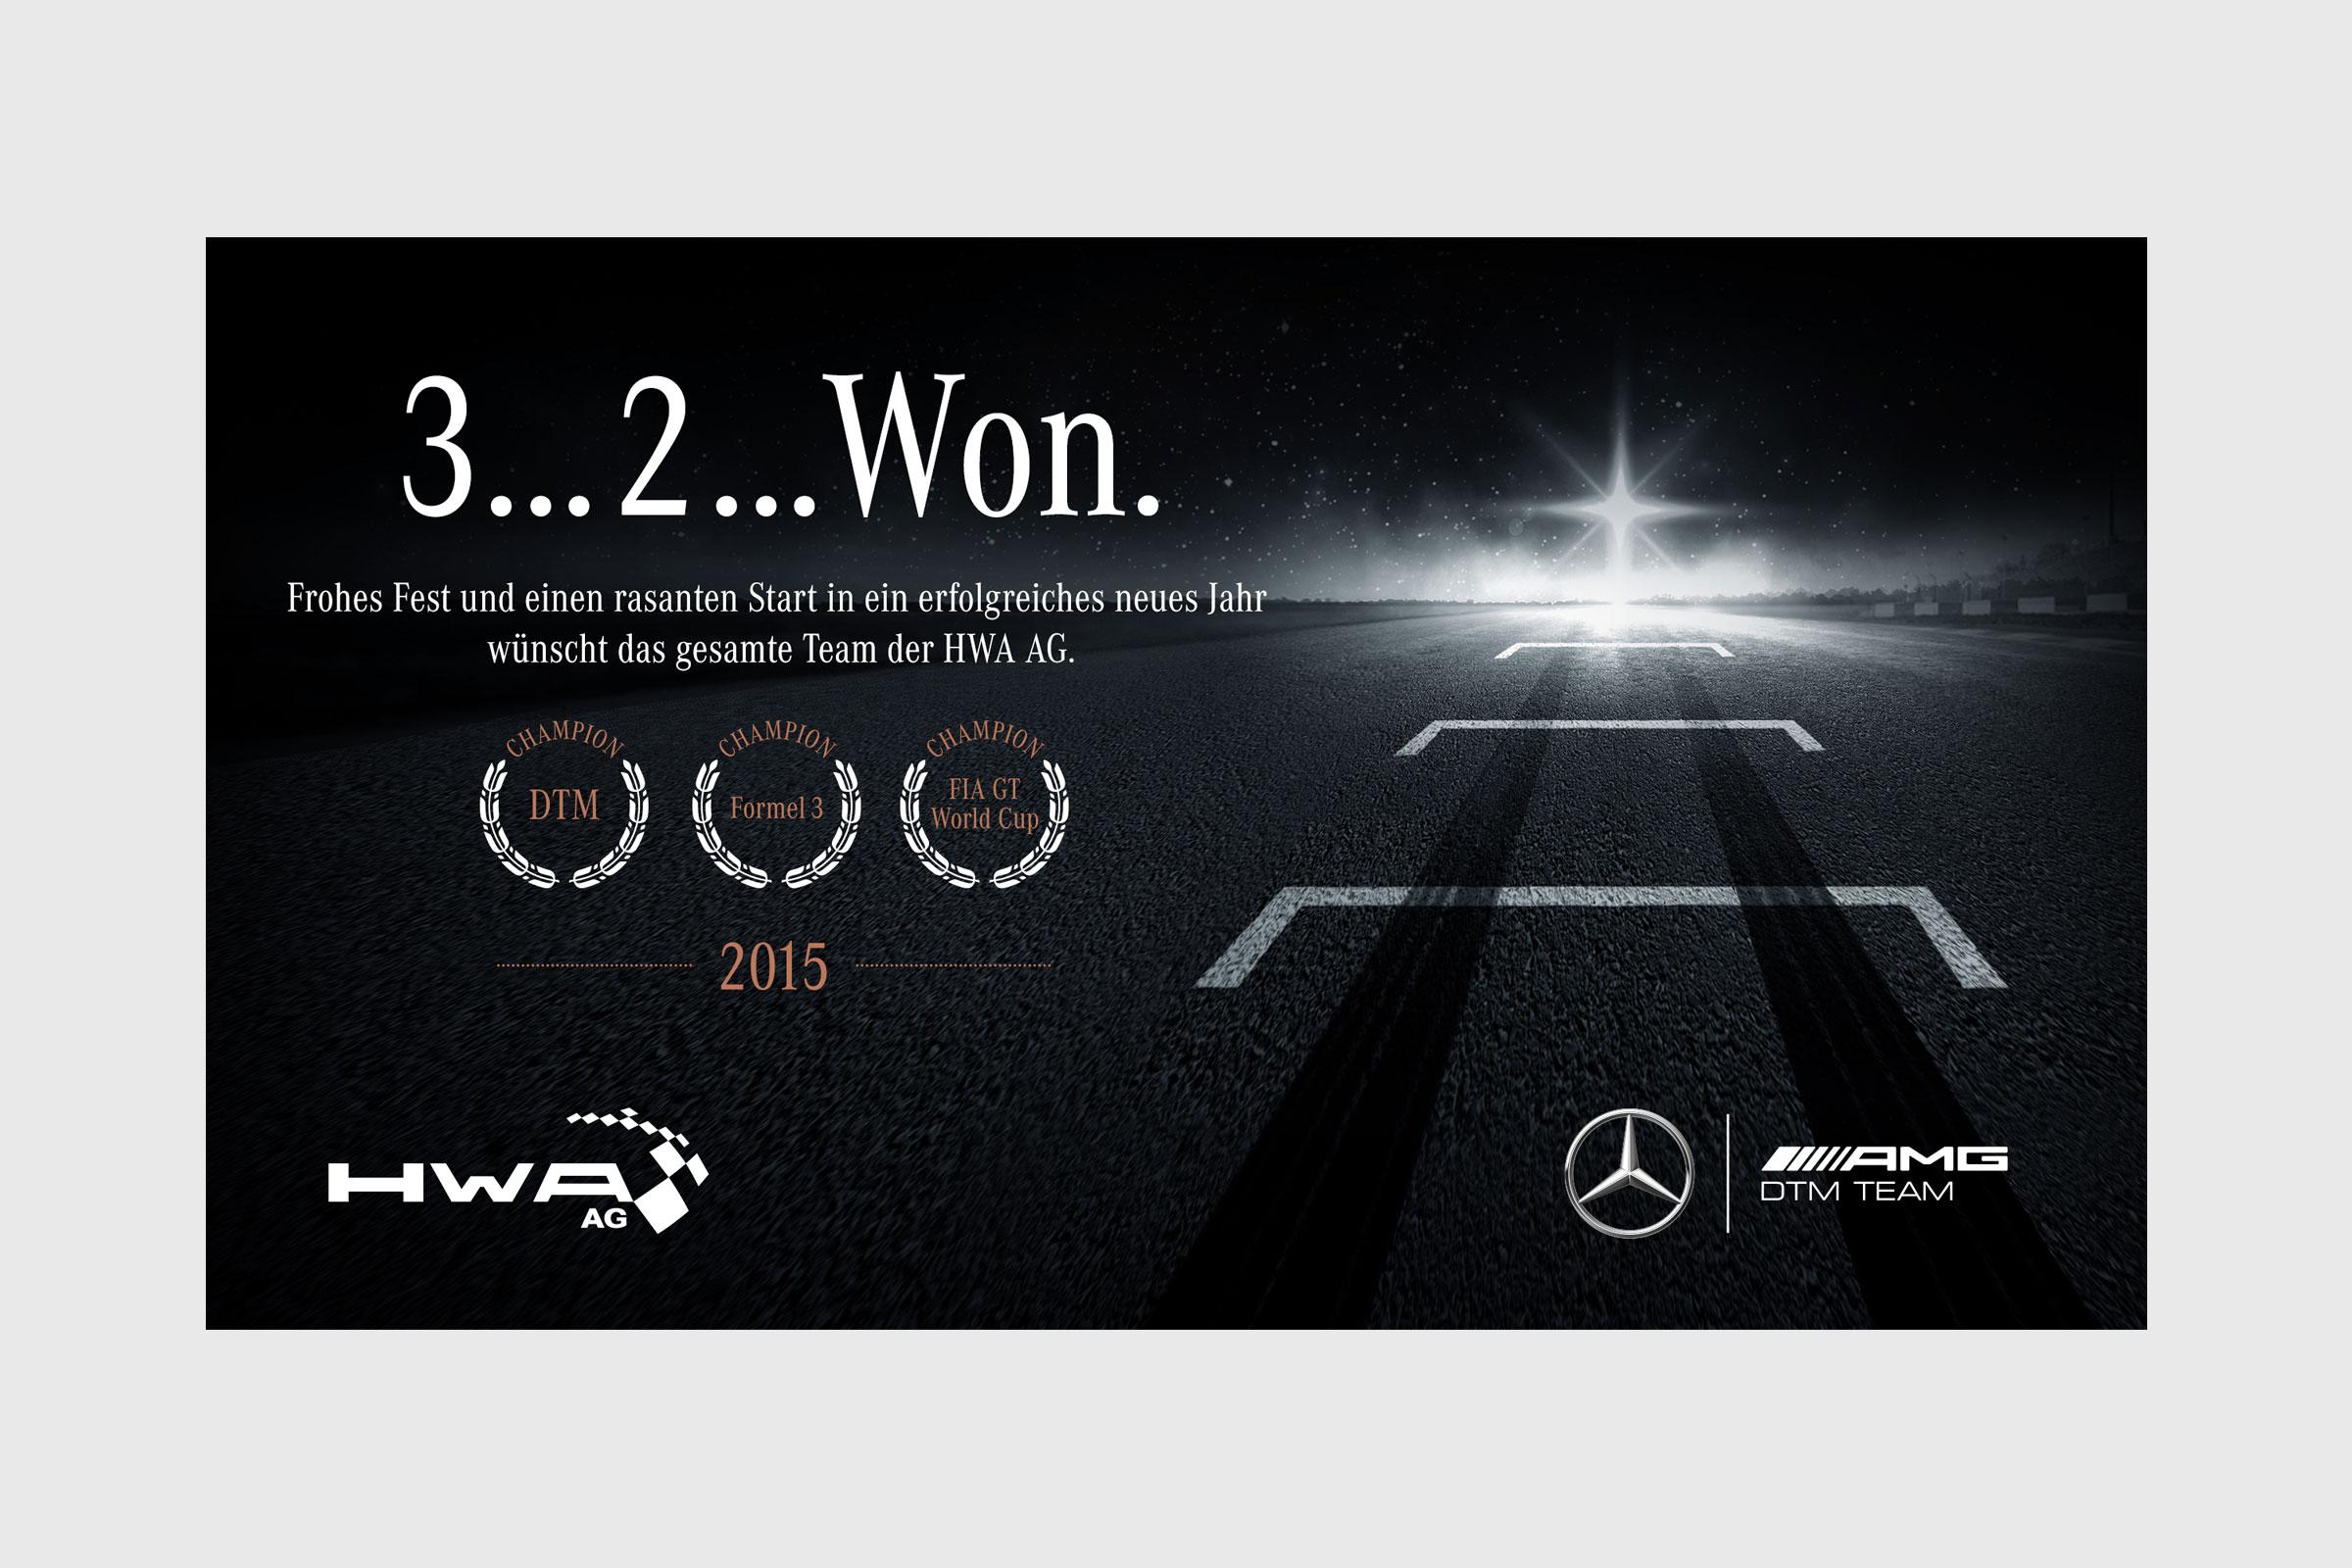 3… 2… Won.